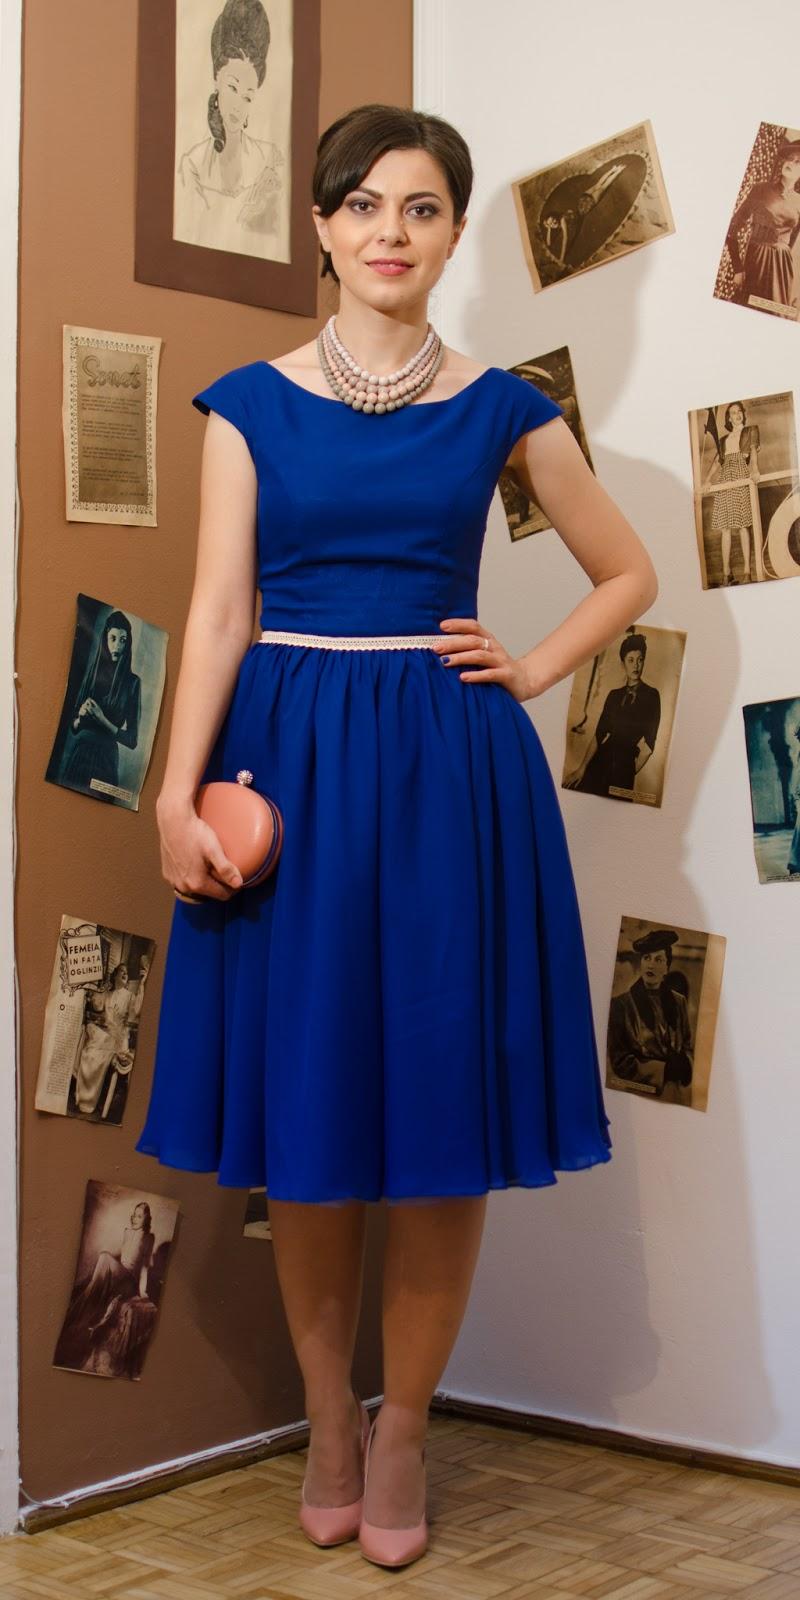 Miss green 50s diva style wedding attire for Diva attire